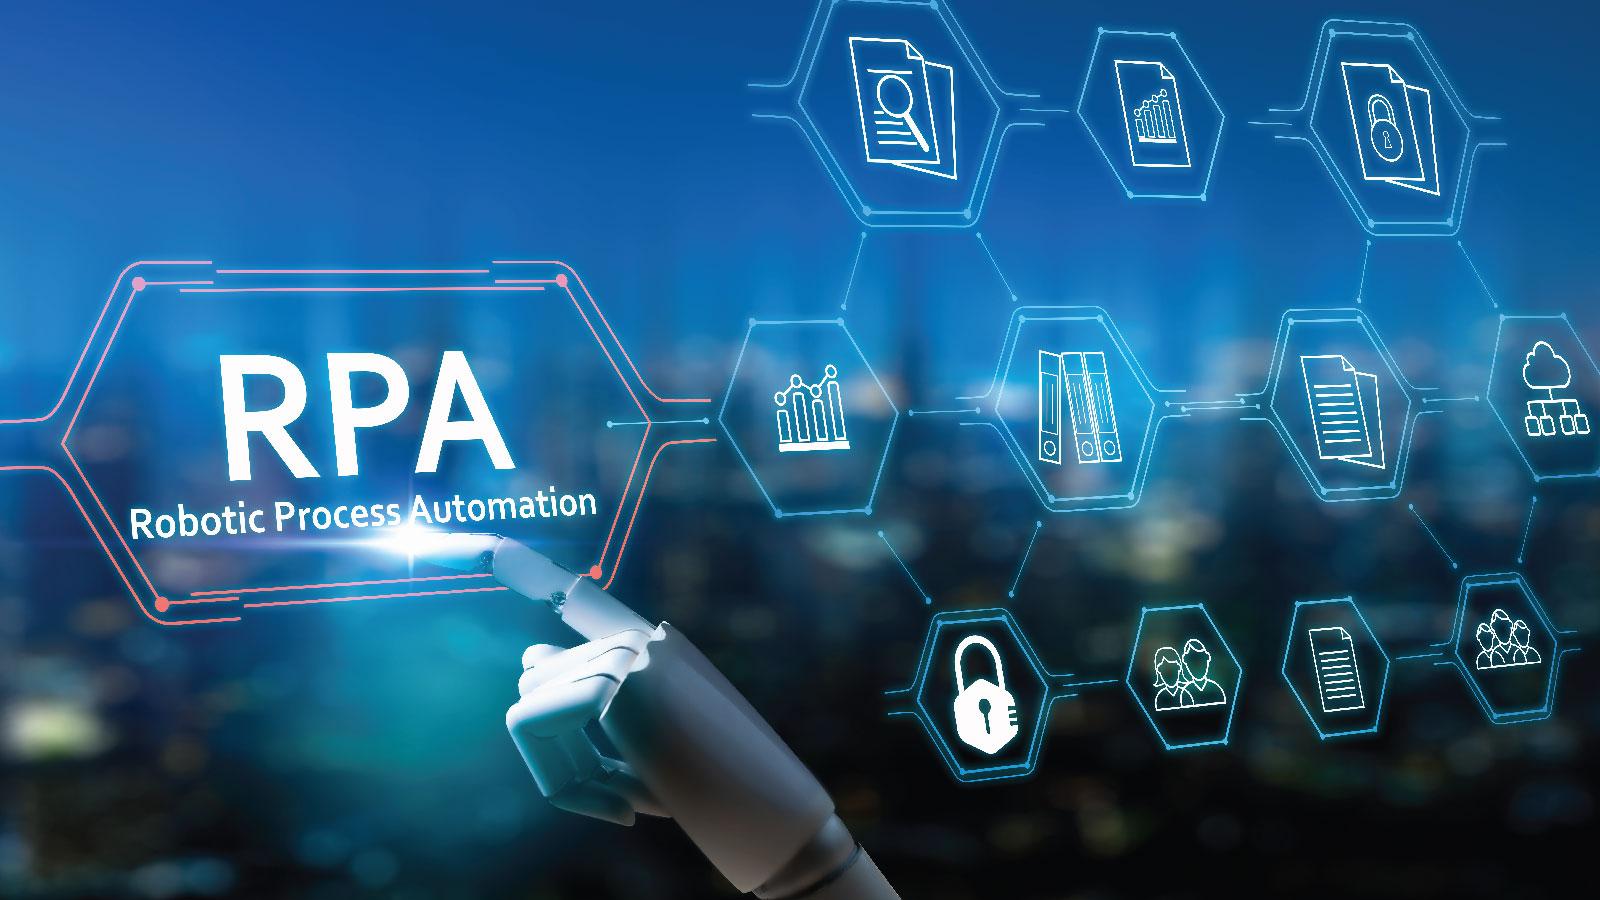 automation, digital transformation, RPA, Gartner, transparent governance and operating model, process optimization, integrating RPA, robotic process automation, RPA collaboration, RPA implementation, overall security, RPA trends, enterprises, 2020, robot capabilities, strategic transformation CTO, CEO, automation, digital transformation, RPA,